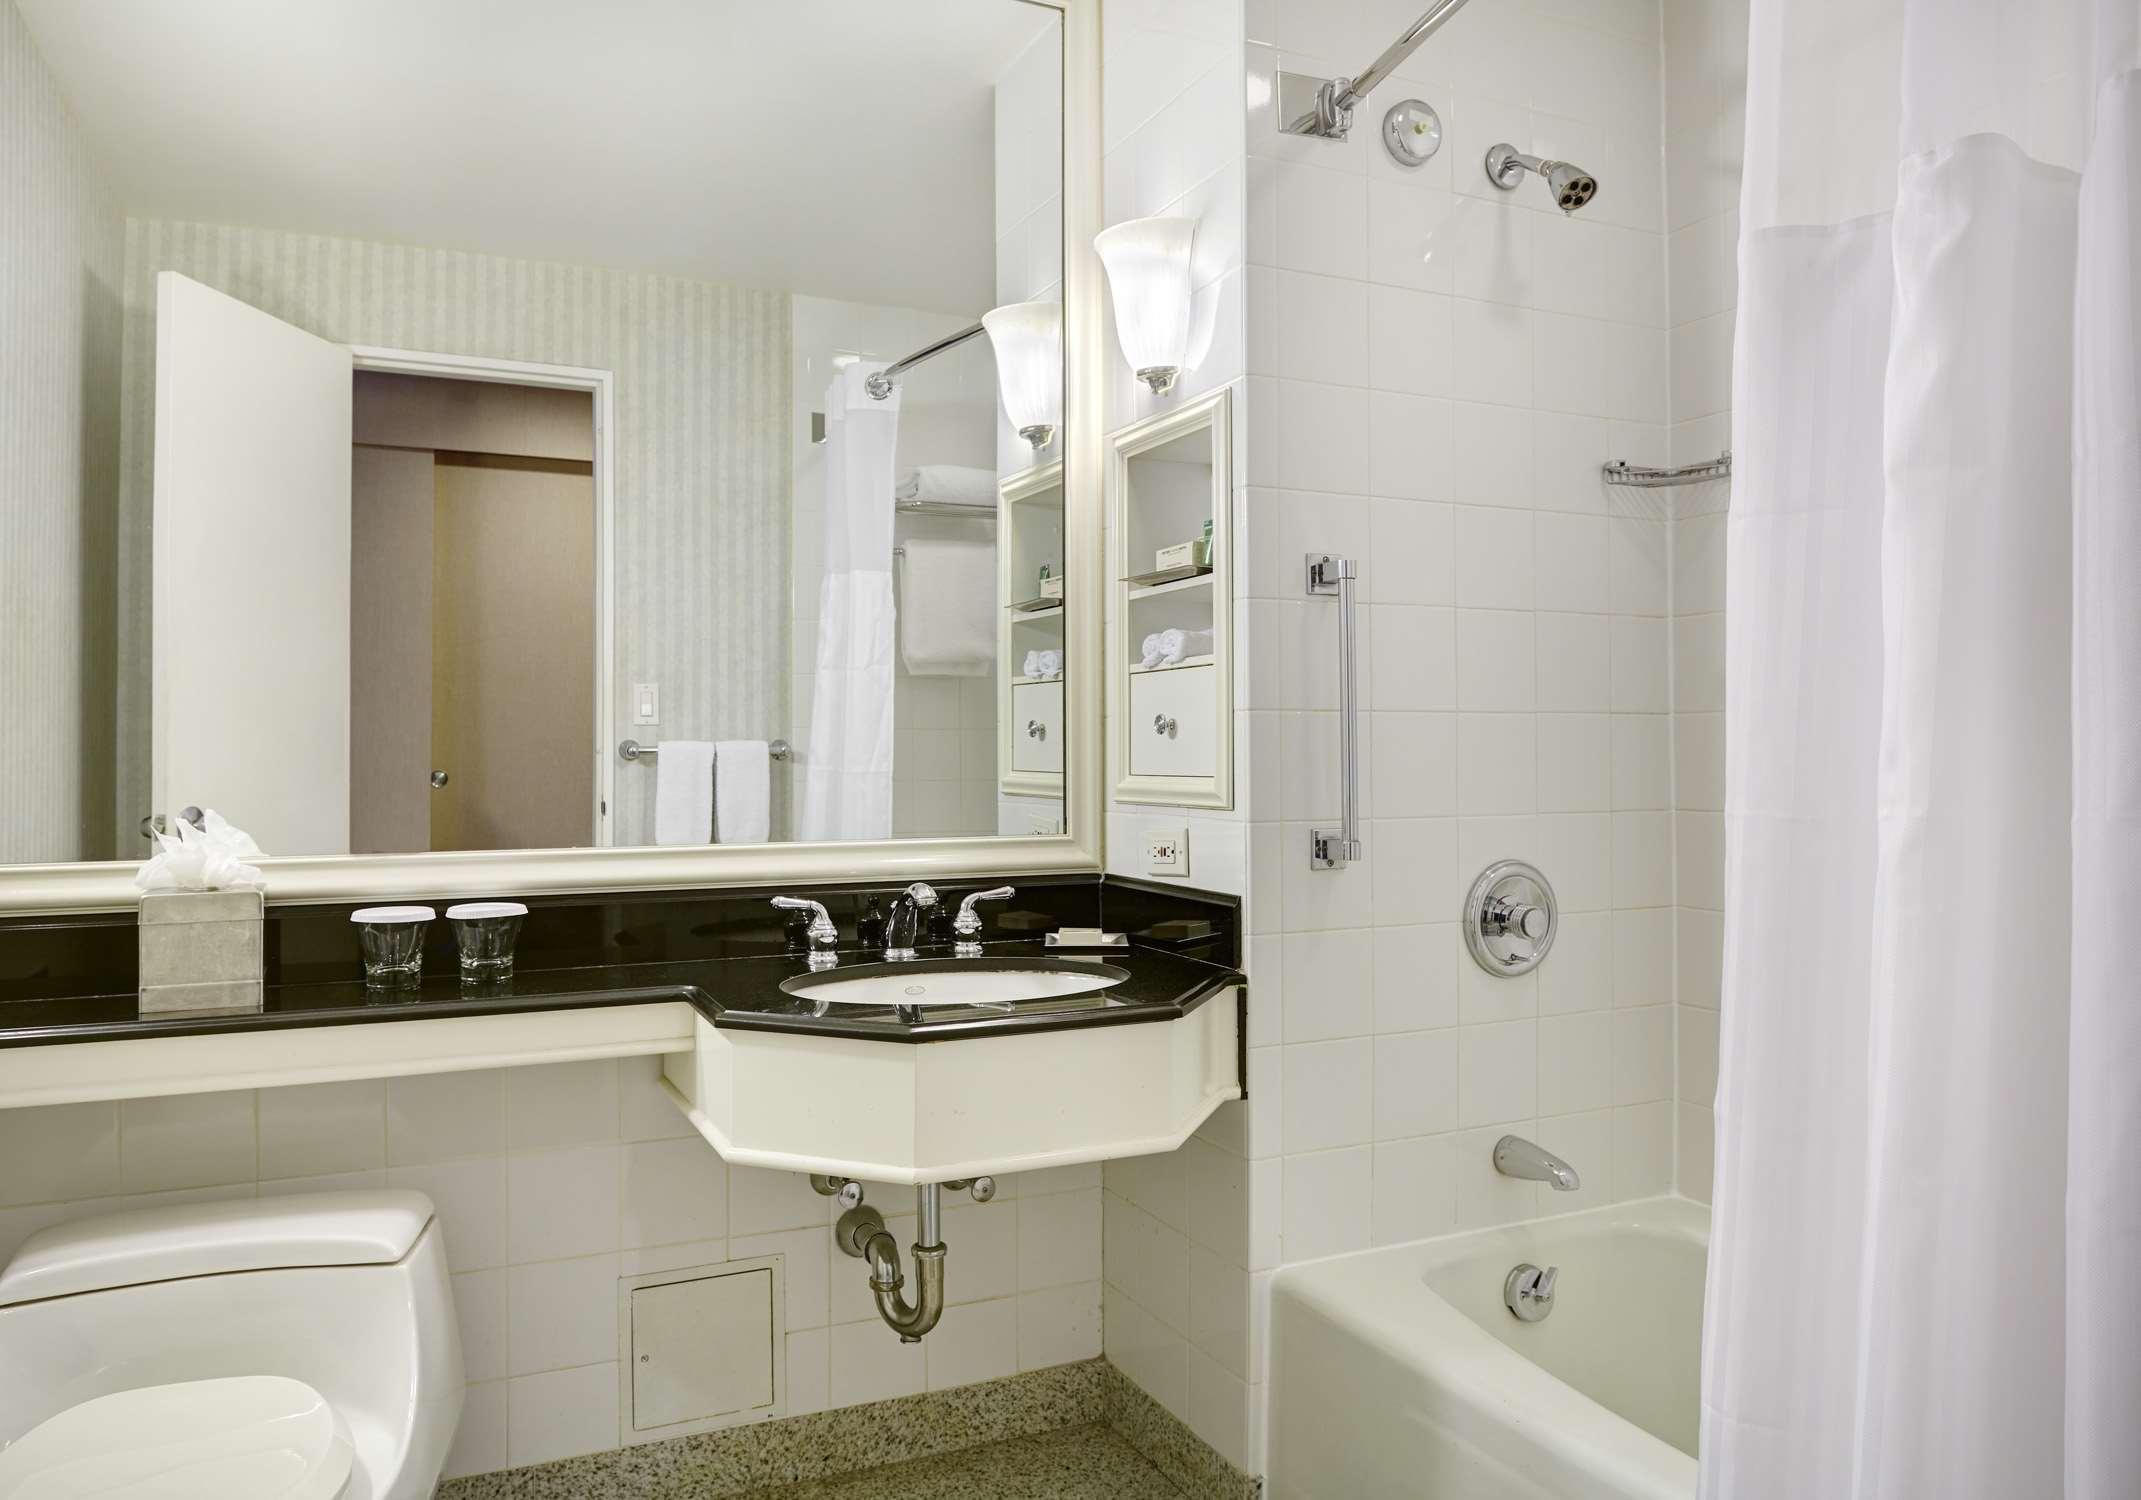 New York Hilton Midtown image 25